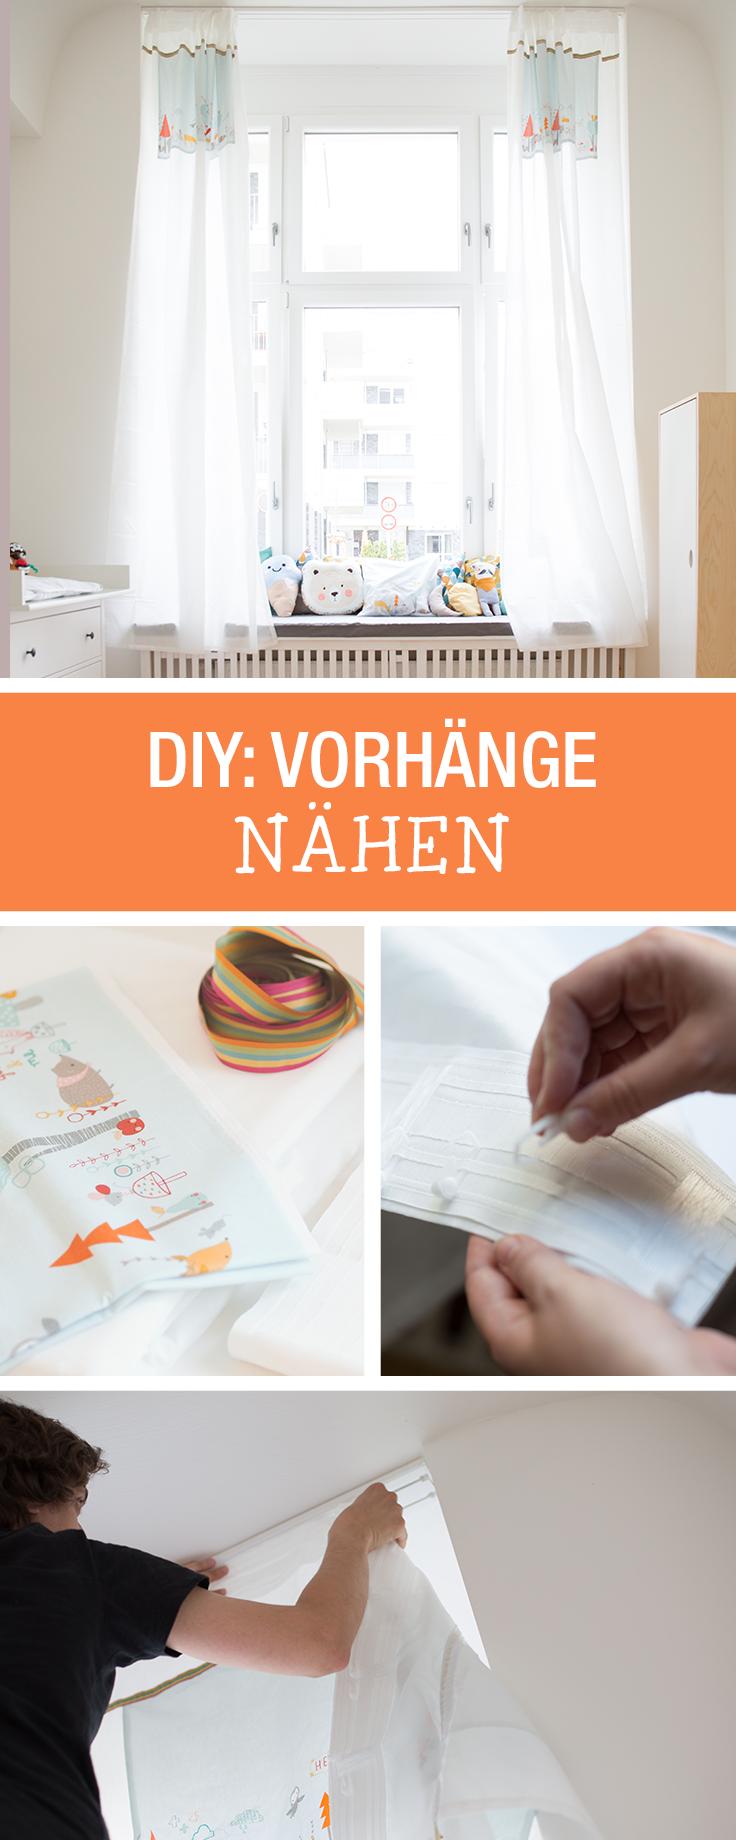 DIY-Anleitung: Vorhänge fürs Kinderzimmer nähen via DaWanda.com ...